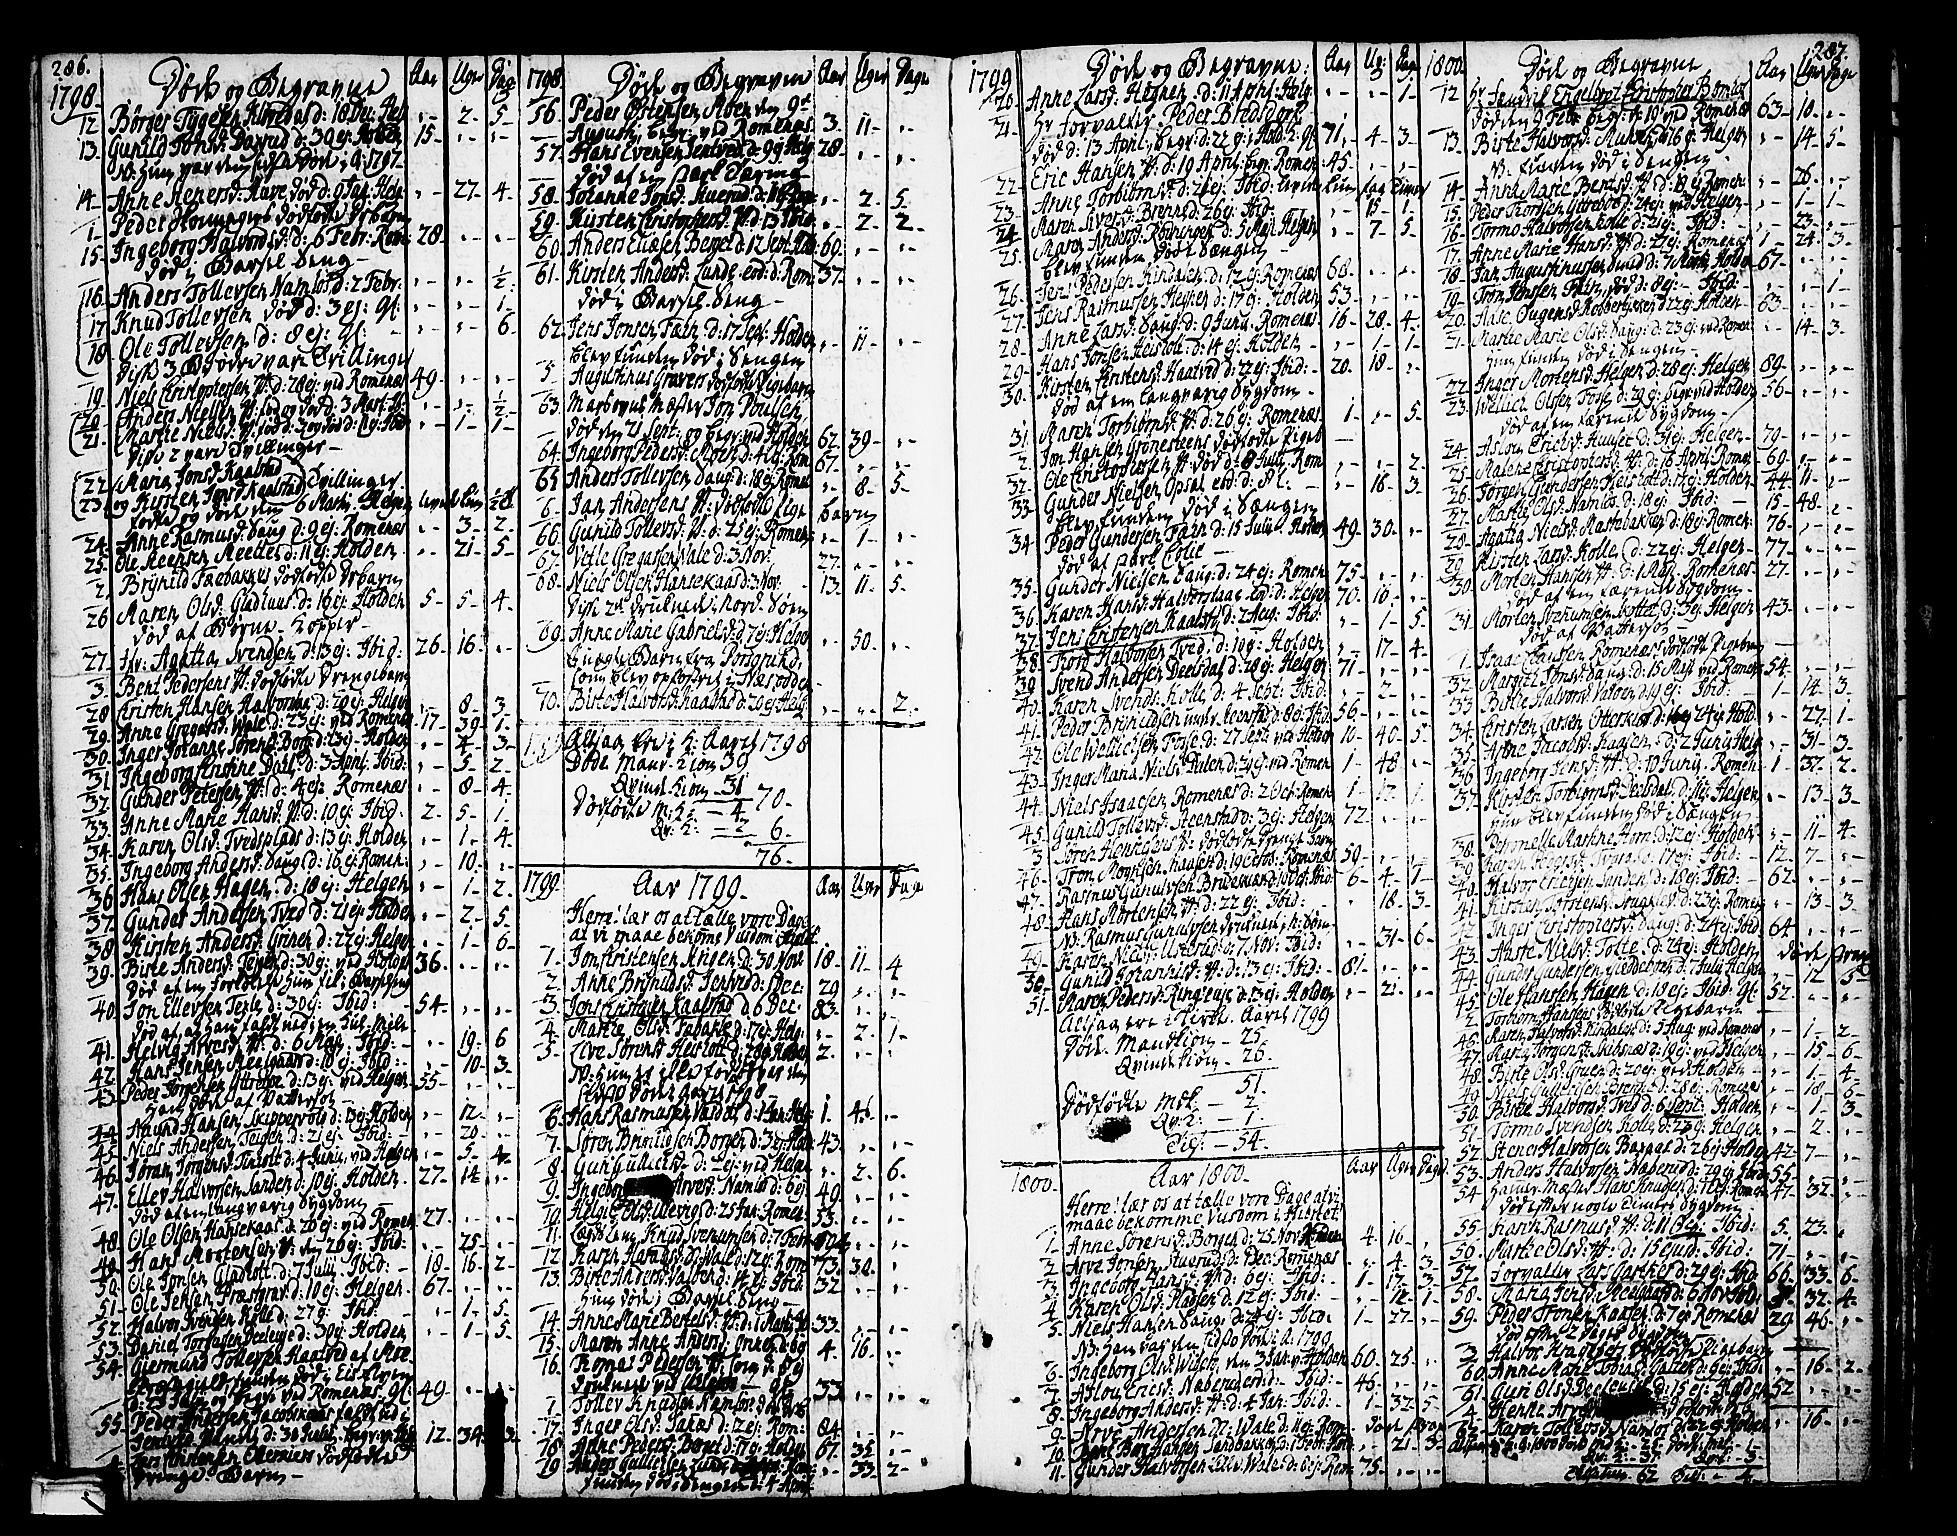 SAKO, Holla kirkebøker, F/Fa/L0002: Ministerialbok nr. 2, 1779-1814, s. 286-287